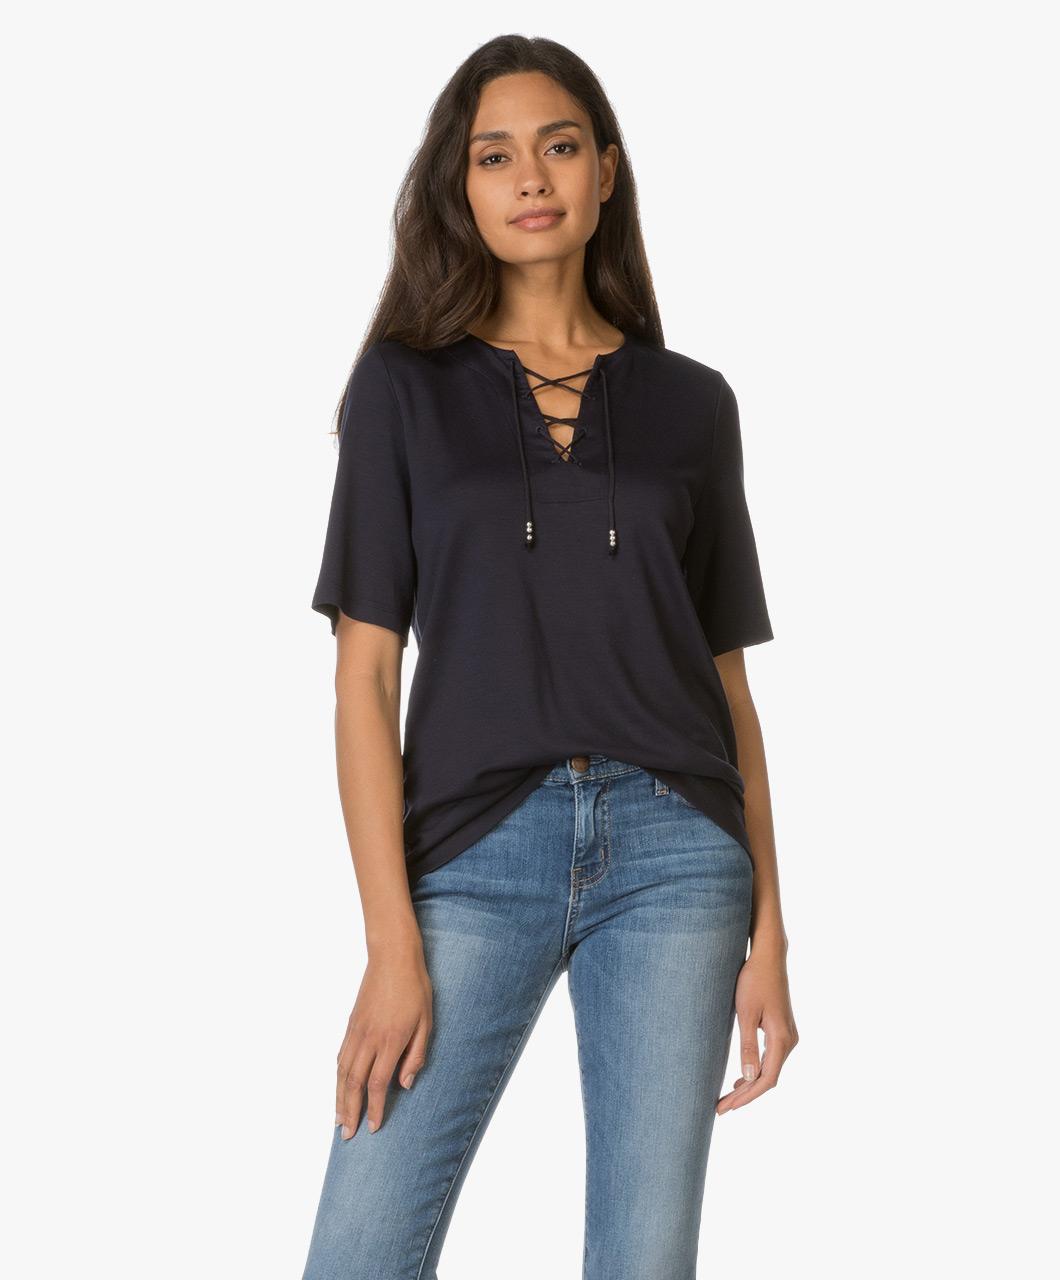 drykorn sahar t shirt with lace closure dark blue sahar 506254 31 donker. Black Bedroom Furniture Sets. Home Design Ideas